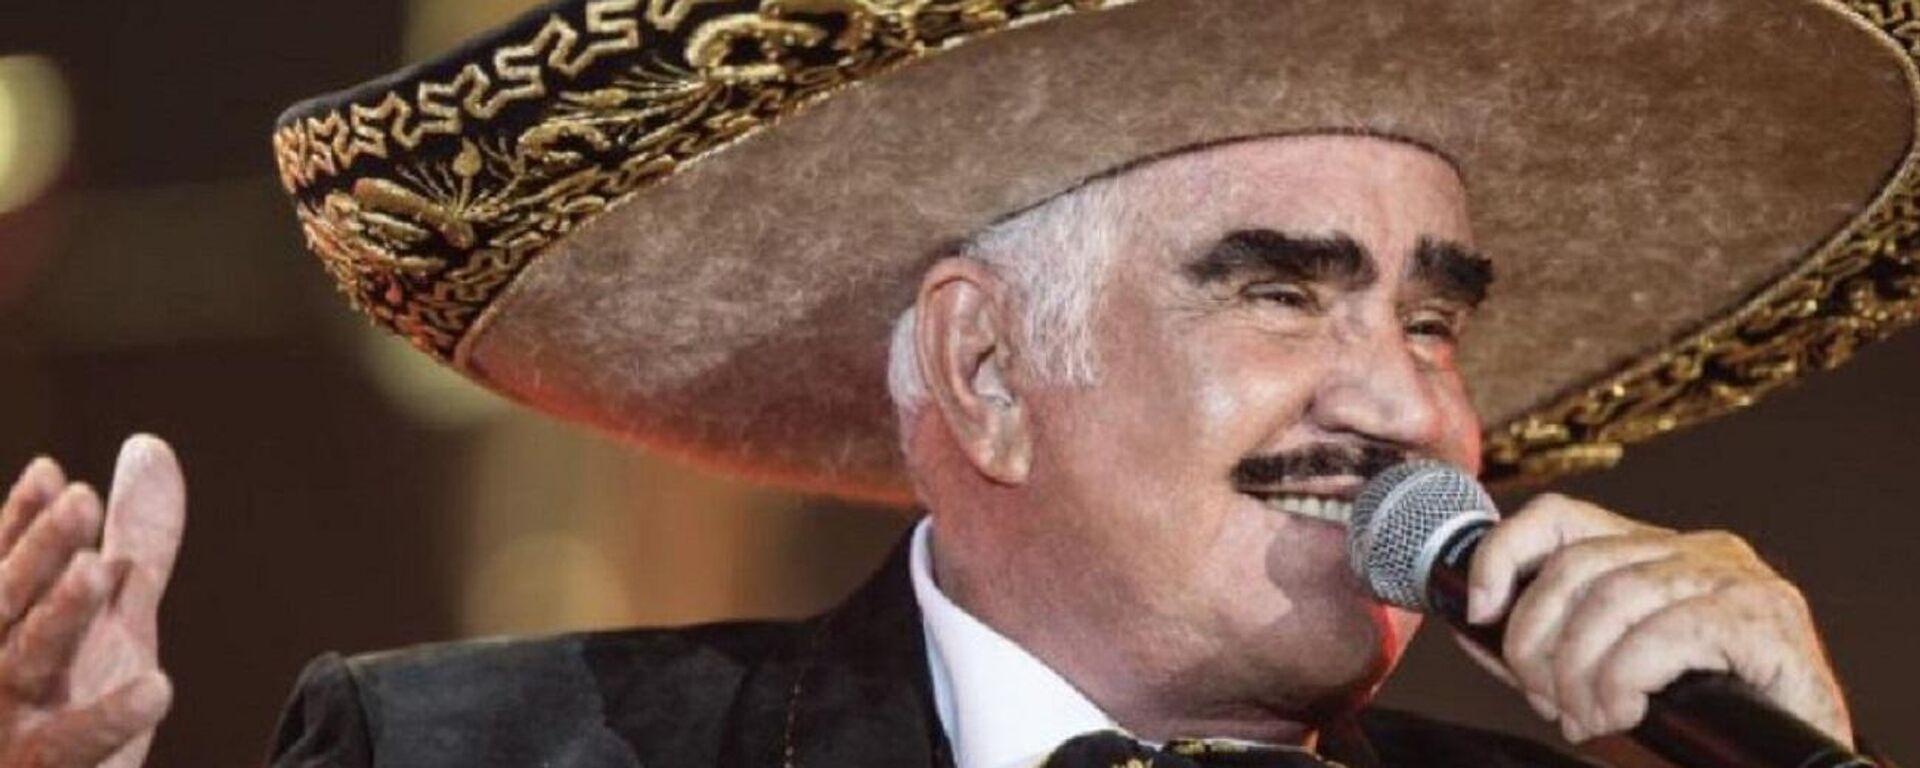 Vicente Fernández, cantante mexicano - Sputnik Mundo, 1920, 12.08.2021